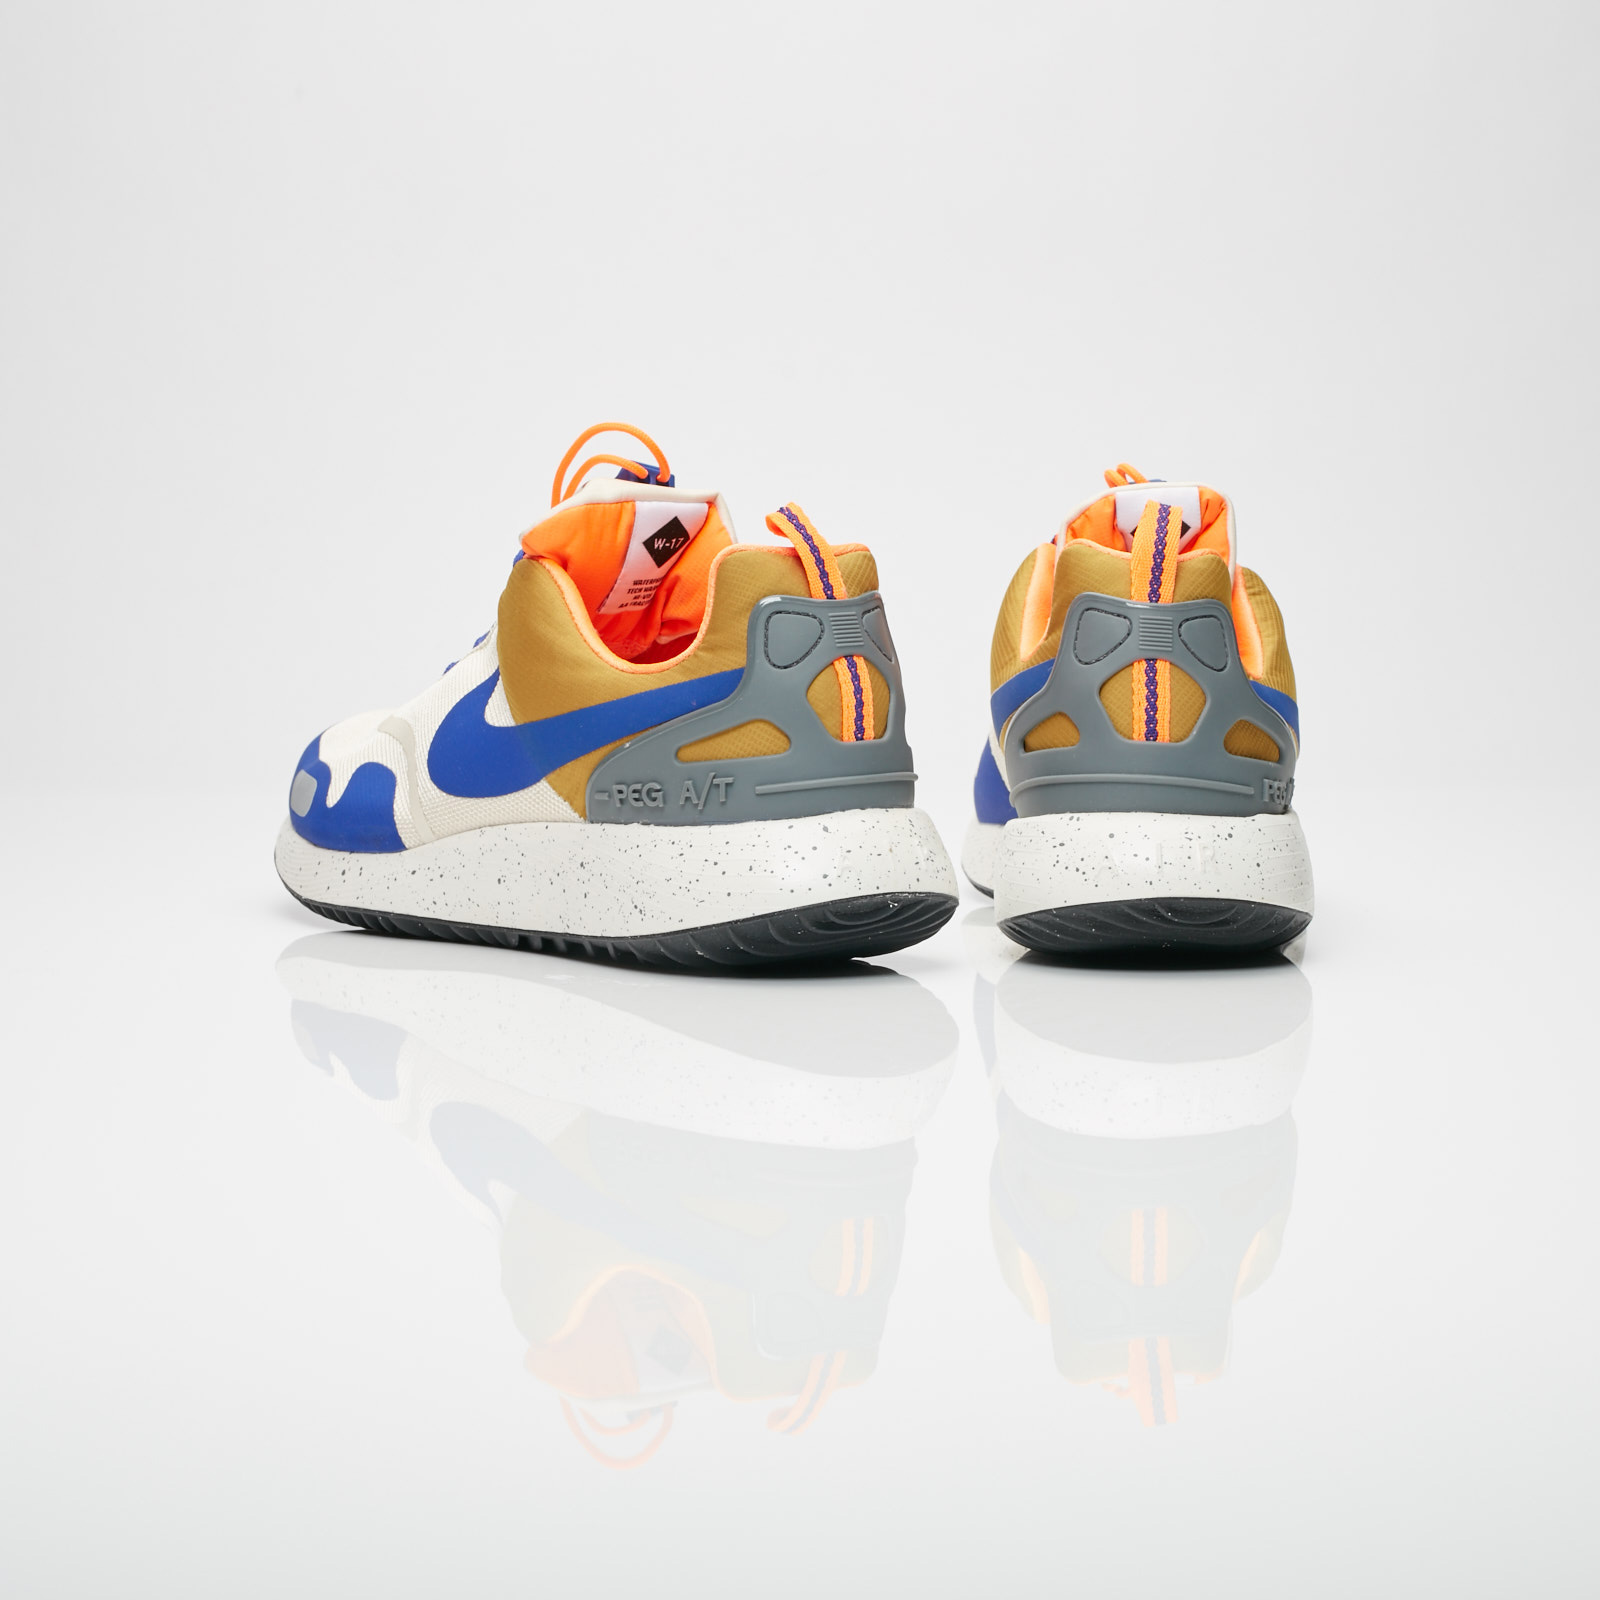 0d4545986601 Nike Air Pegasus A T Winter QS - Ao3296-200 - Sneakersnstuff ...